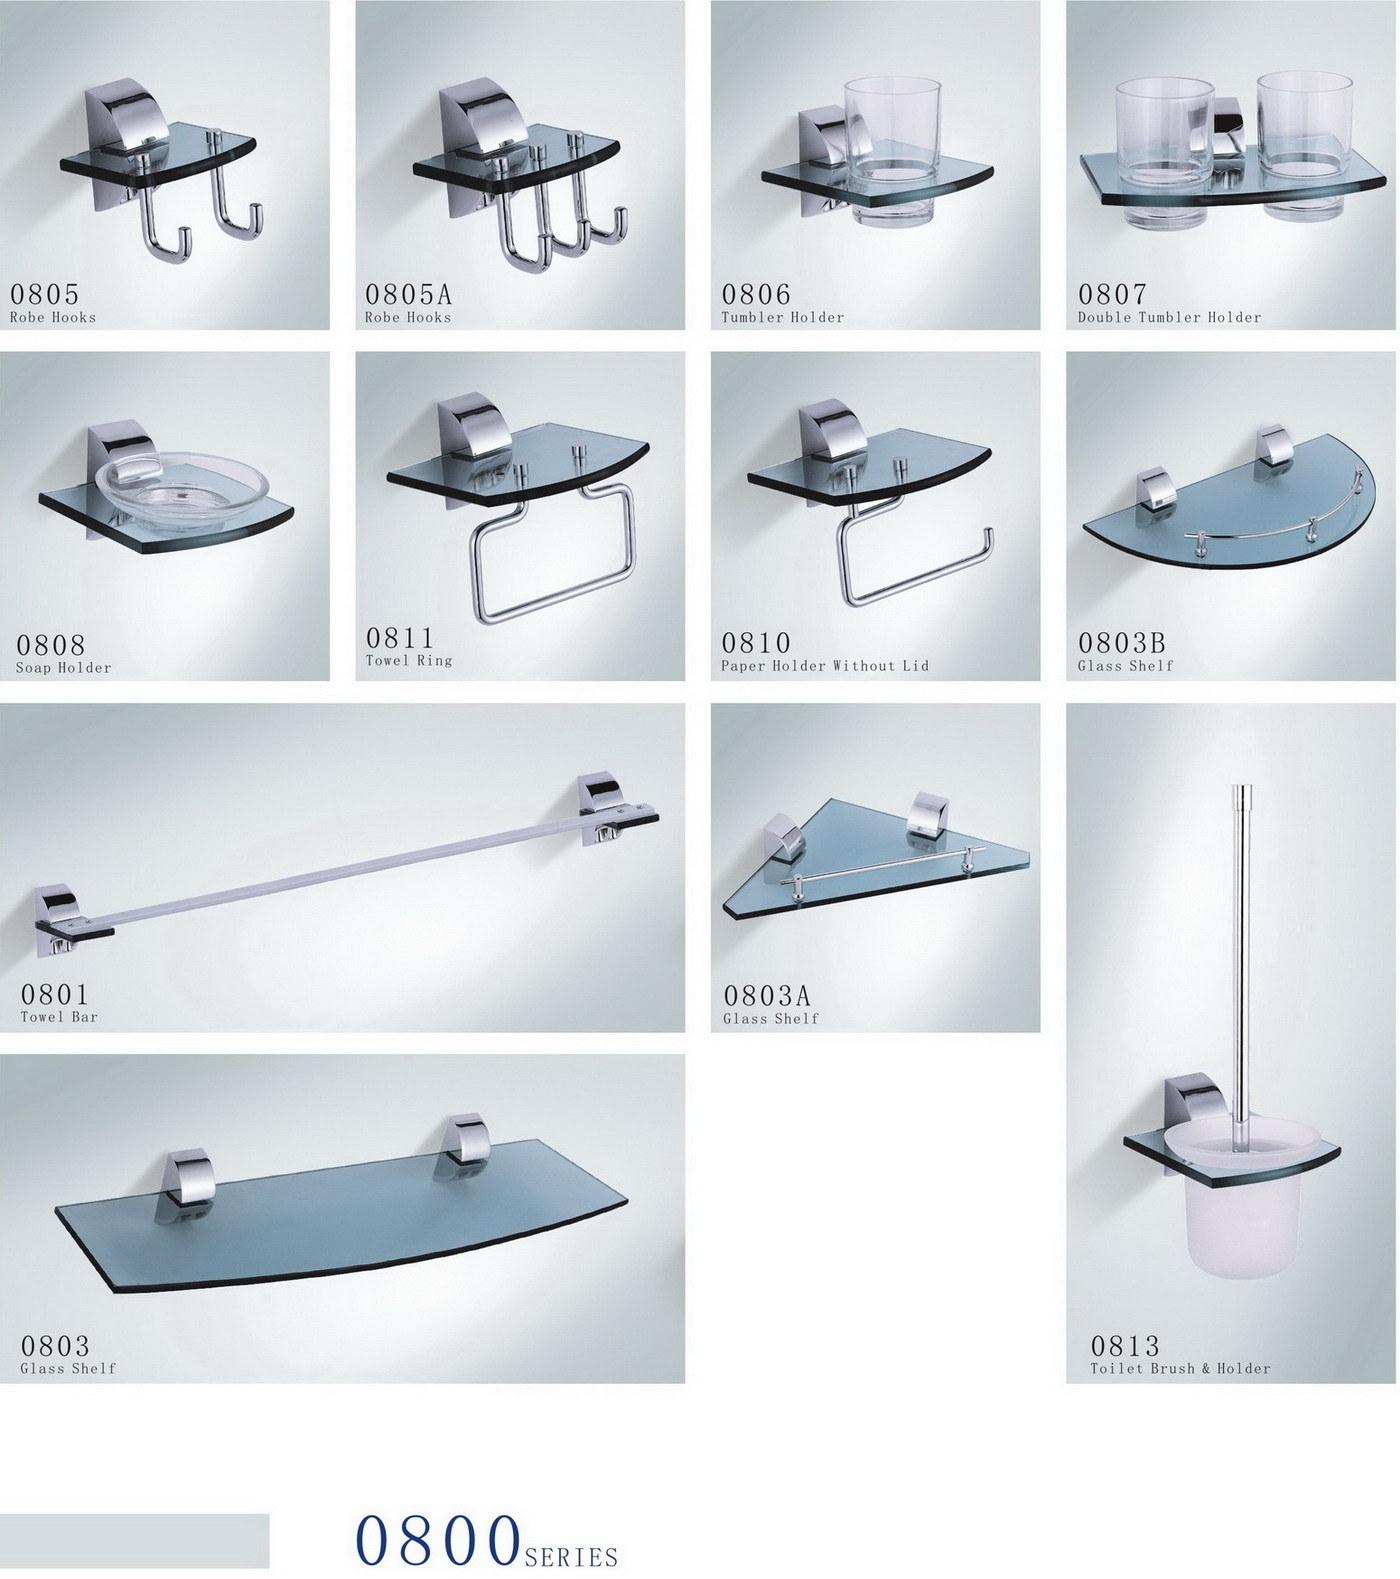 China bathroom accessories towel bar 0800 series photos for Bathroom accessories hs code